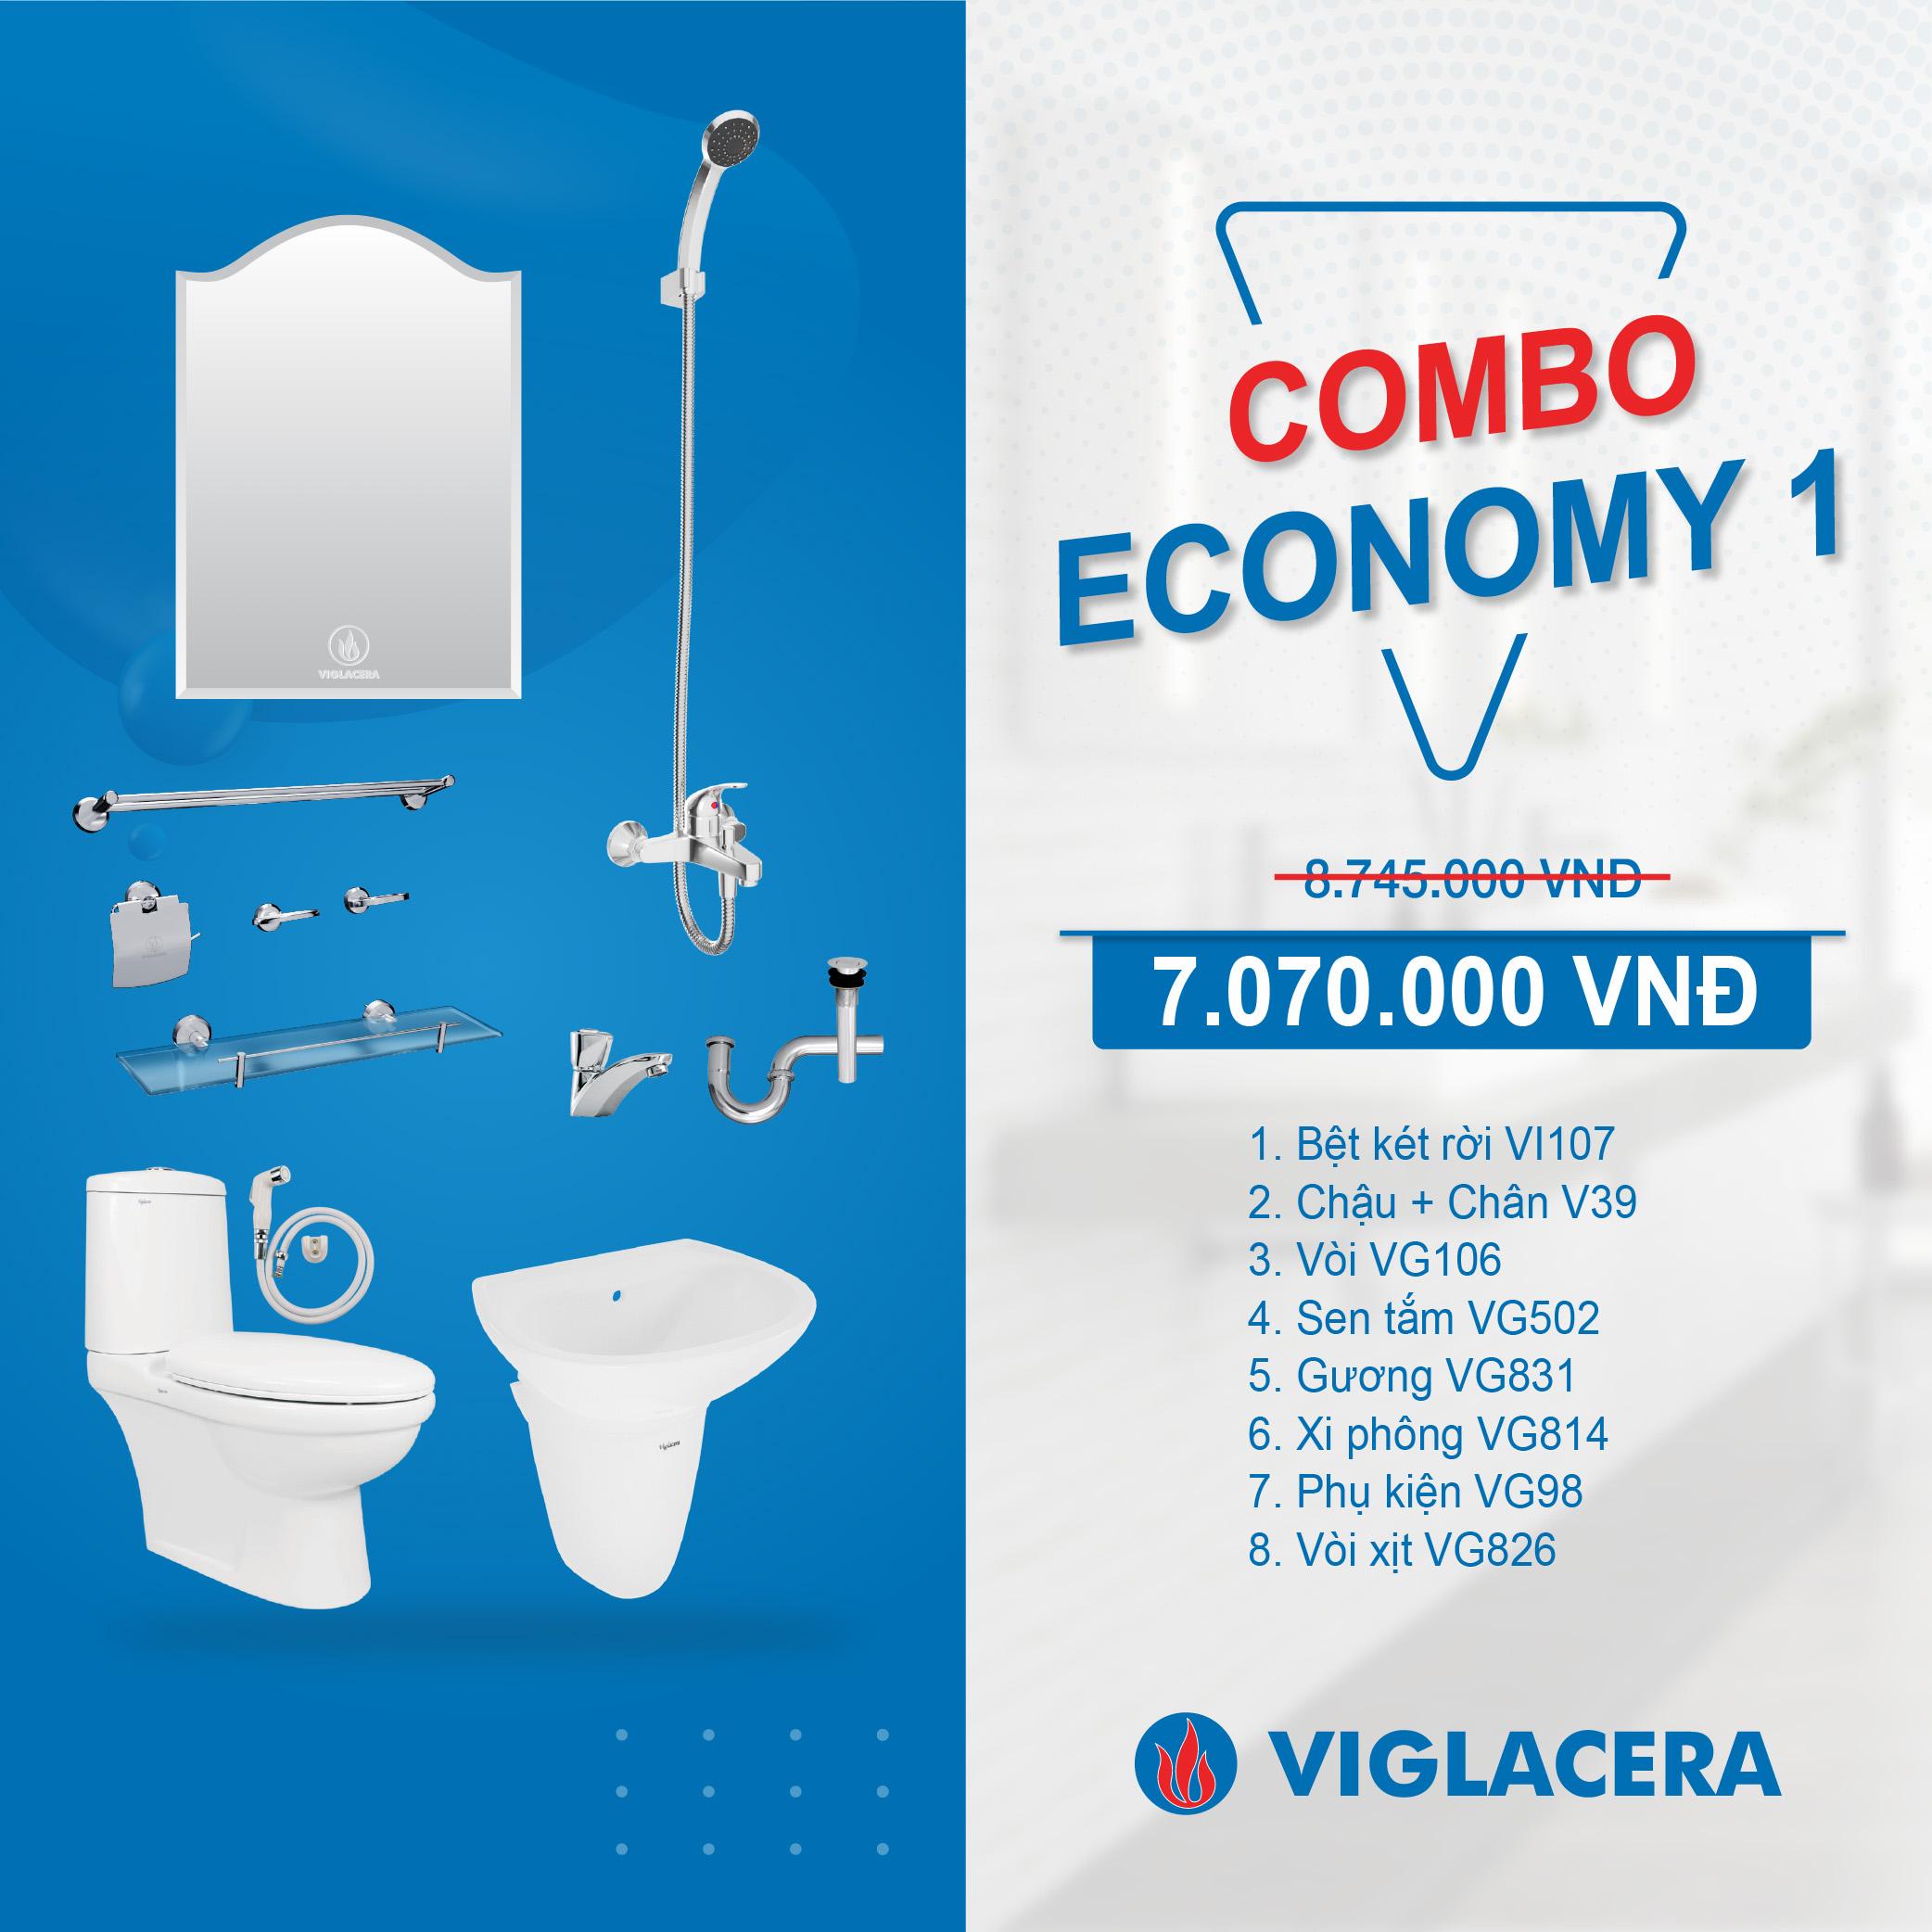 Combo Viglacera Economy 1